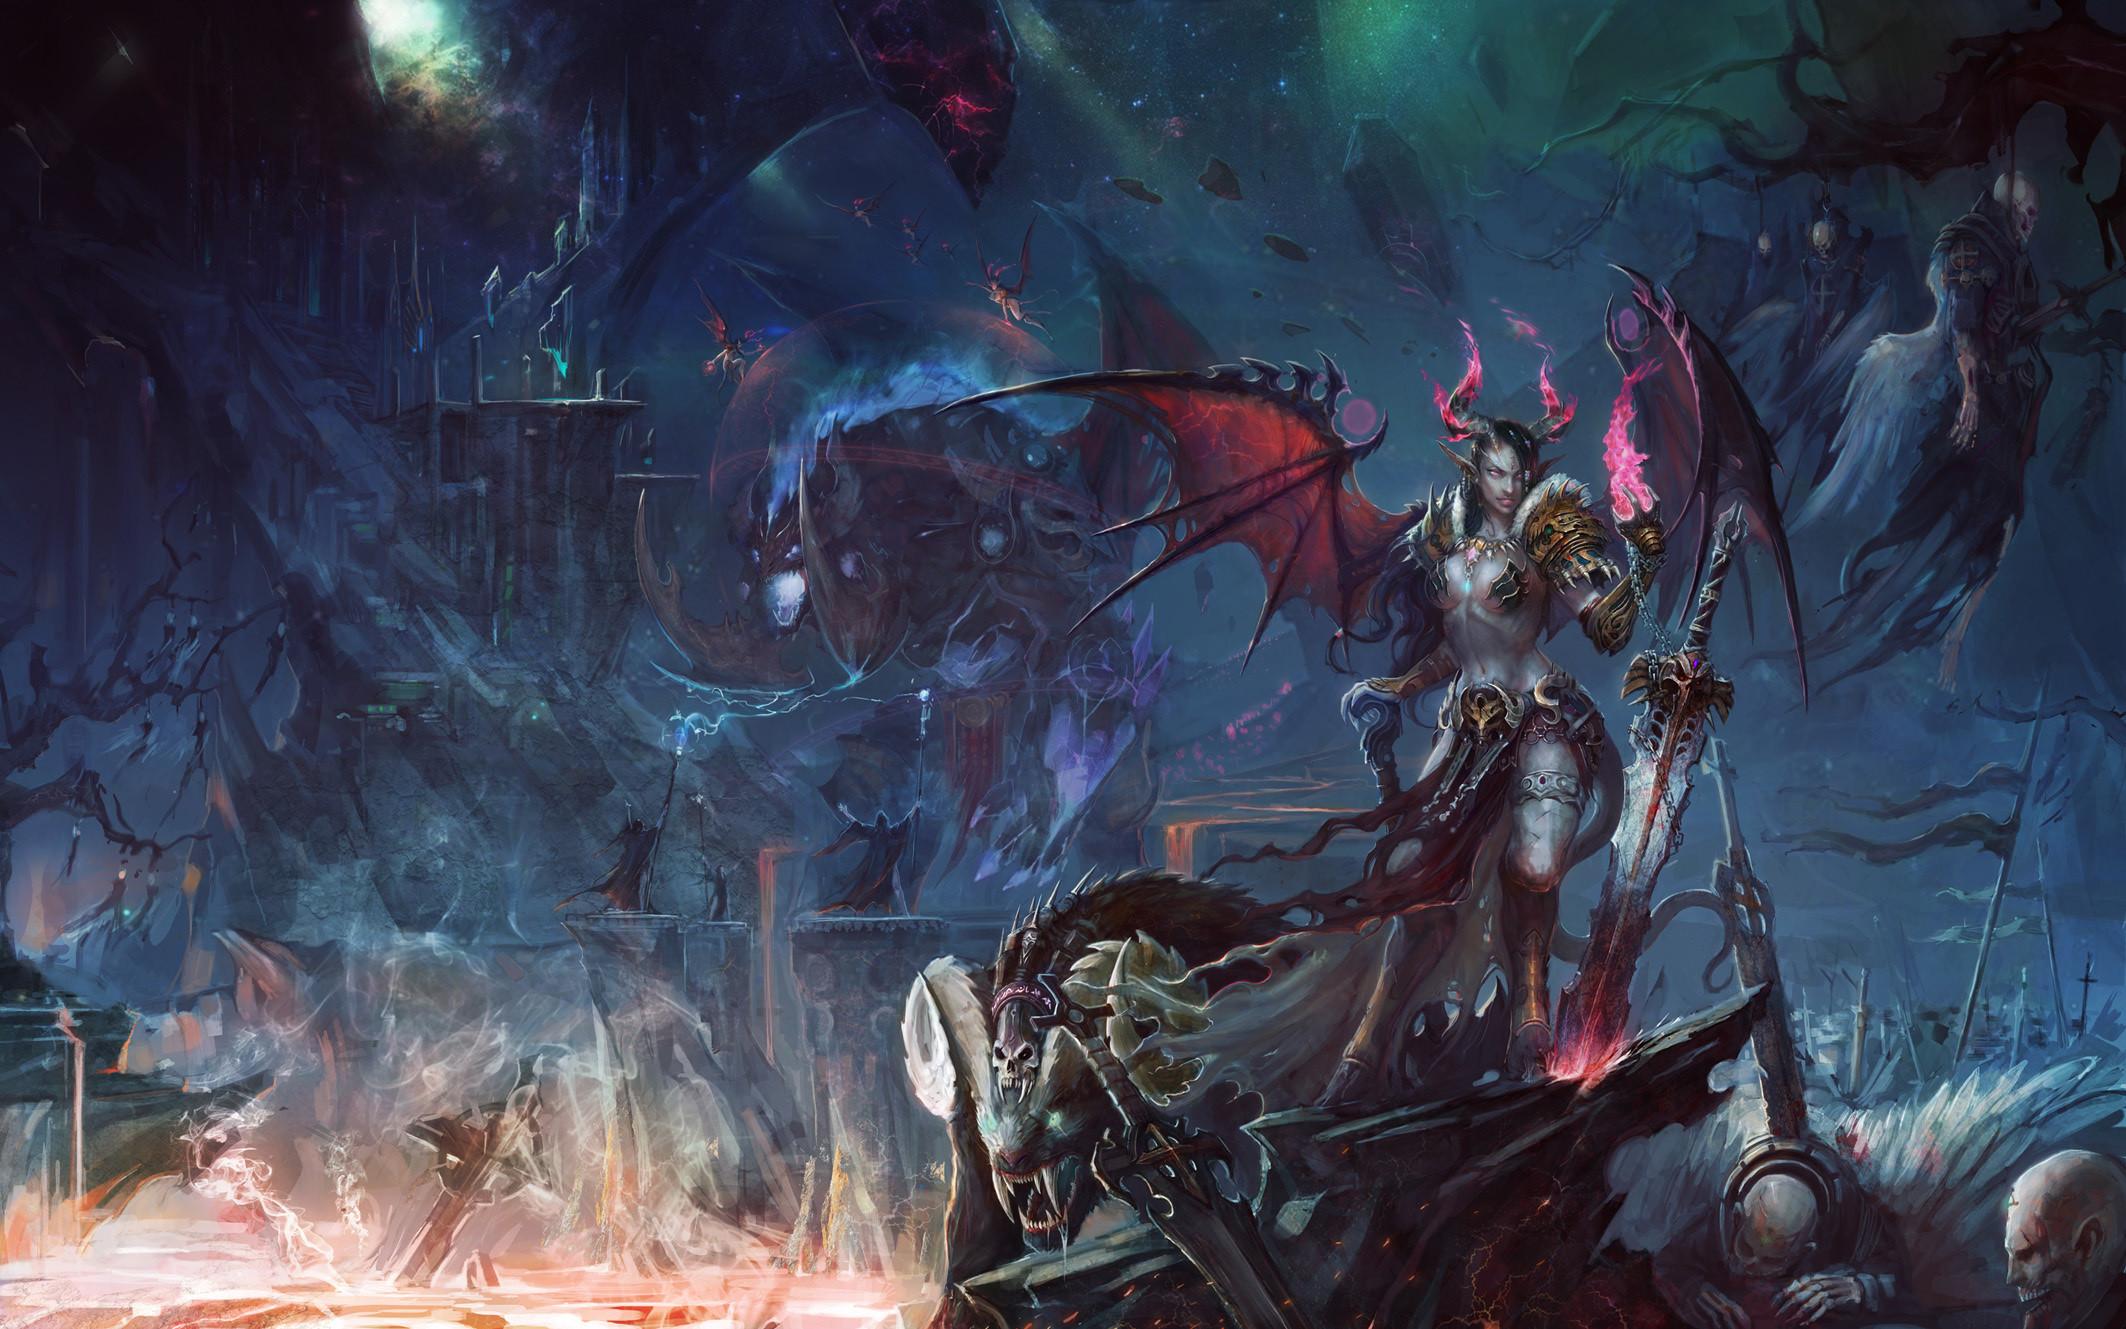 Wallpapers World of WarCraft Wallpapers World of WarCraft ( WoW ) Demons  Warriors Swords Games